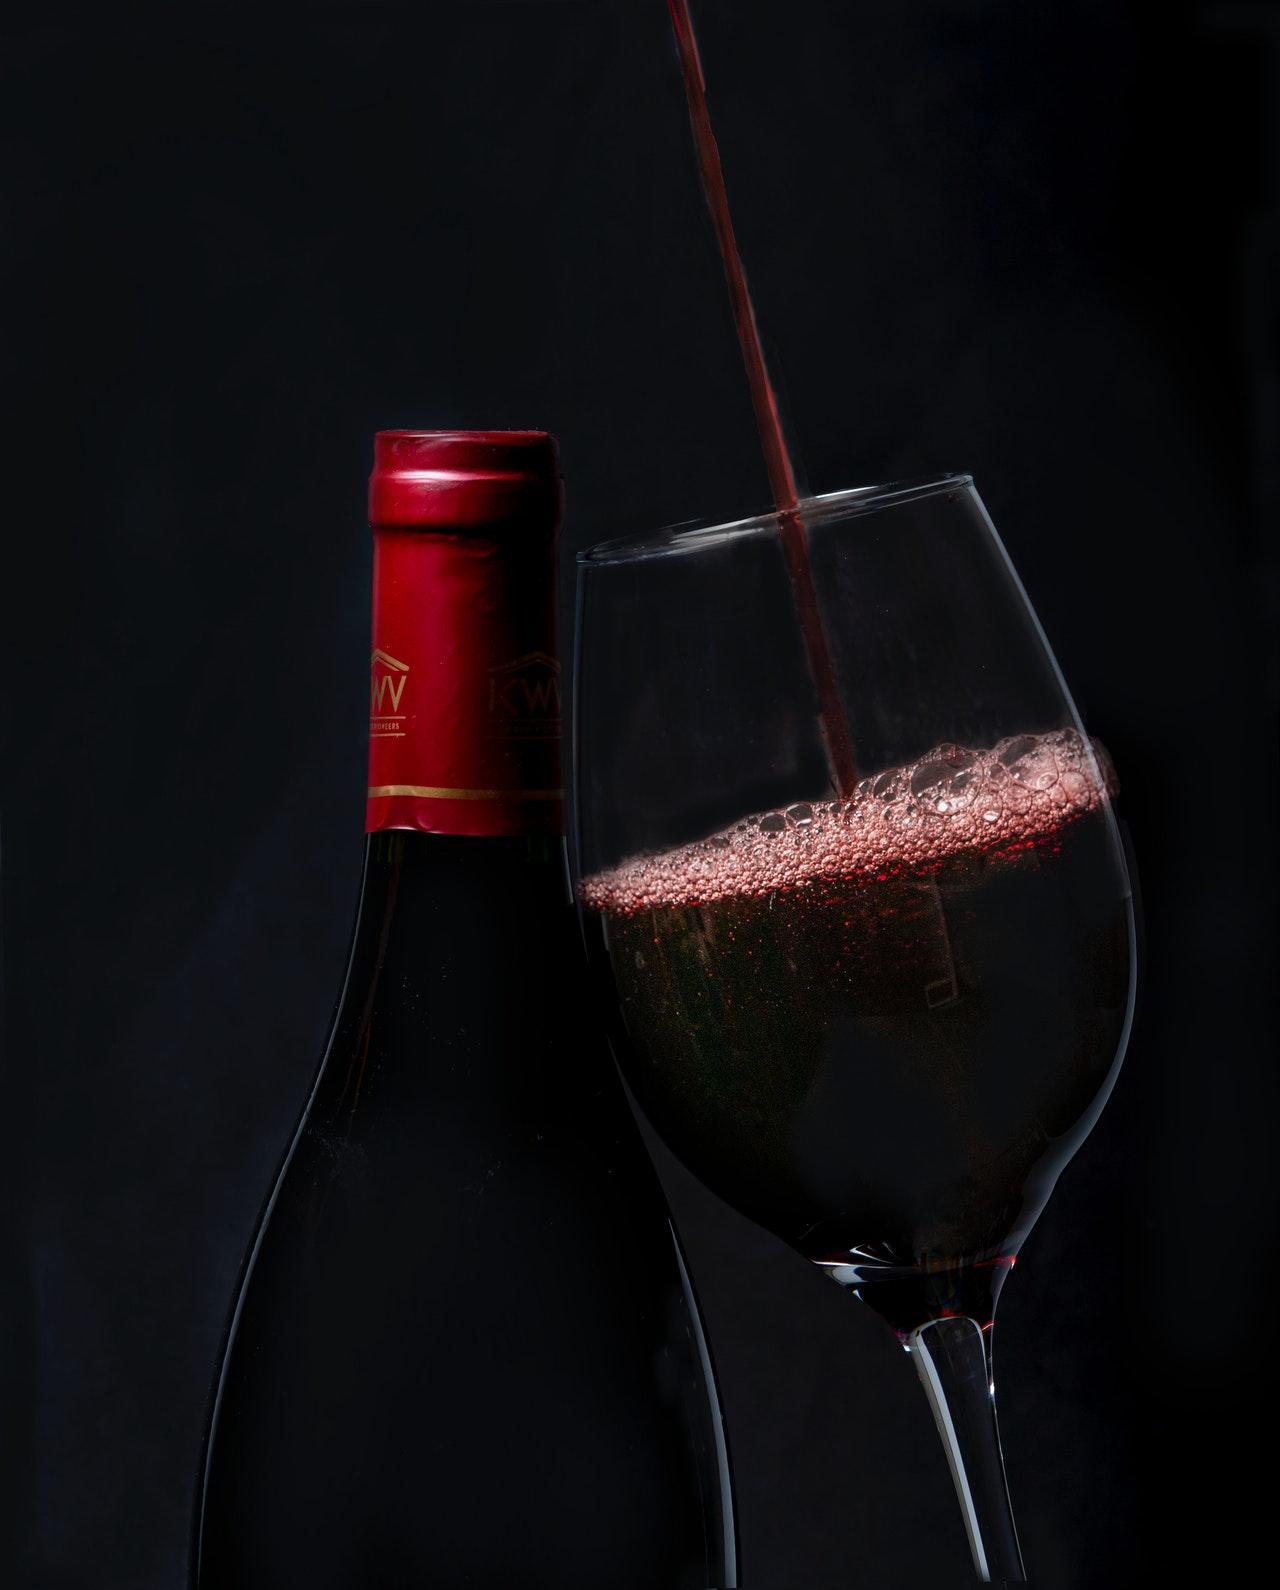 Hong-Kong-wine-bottle